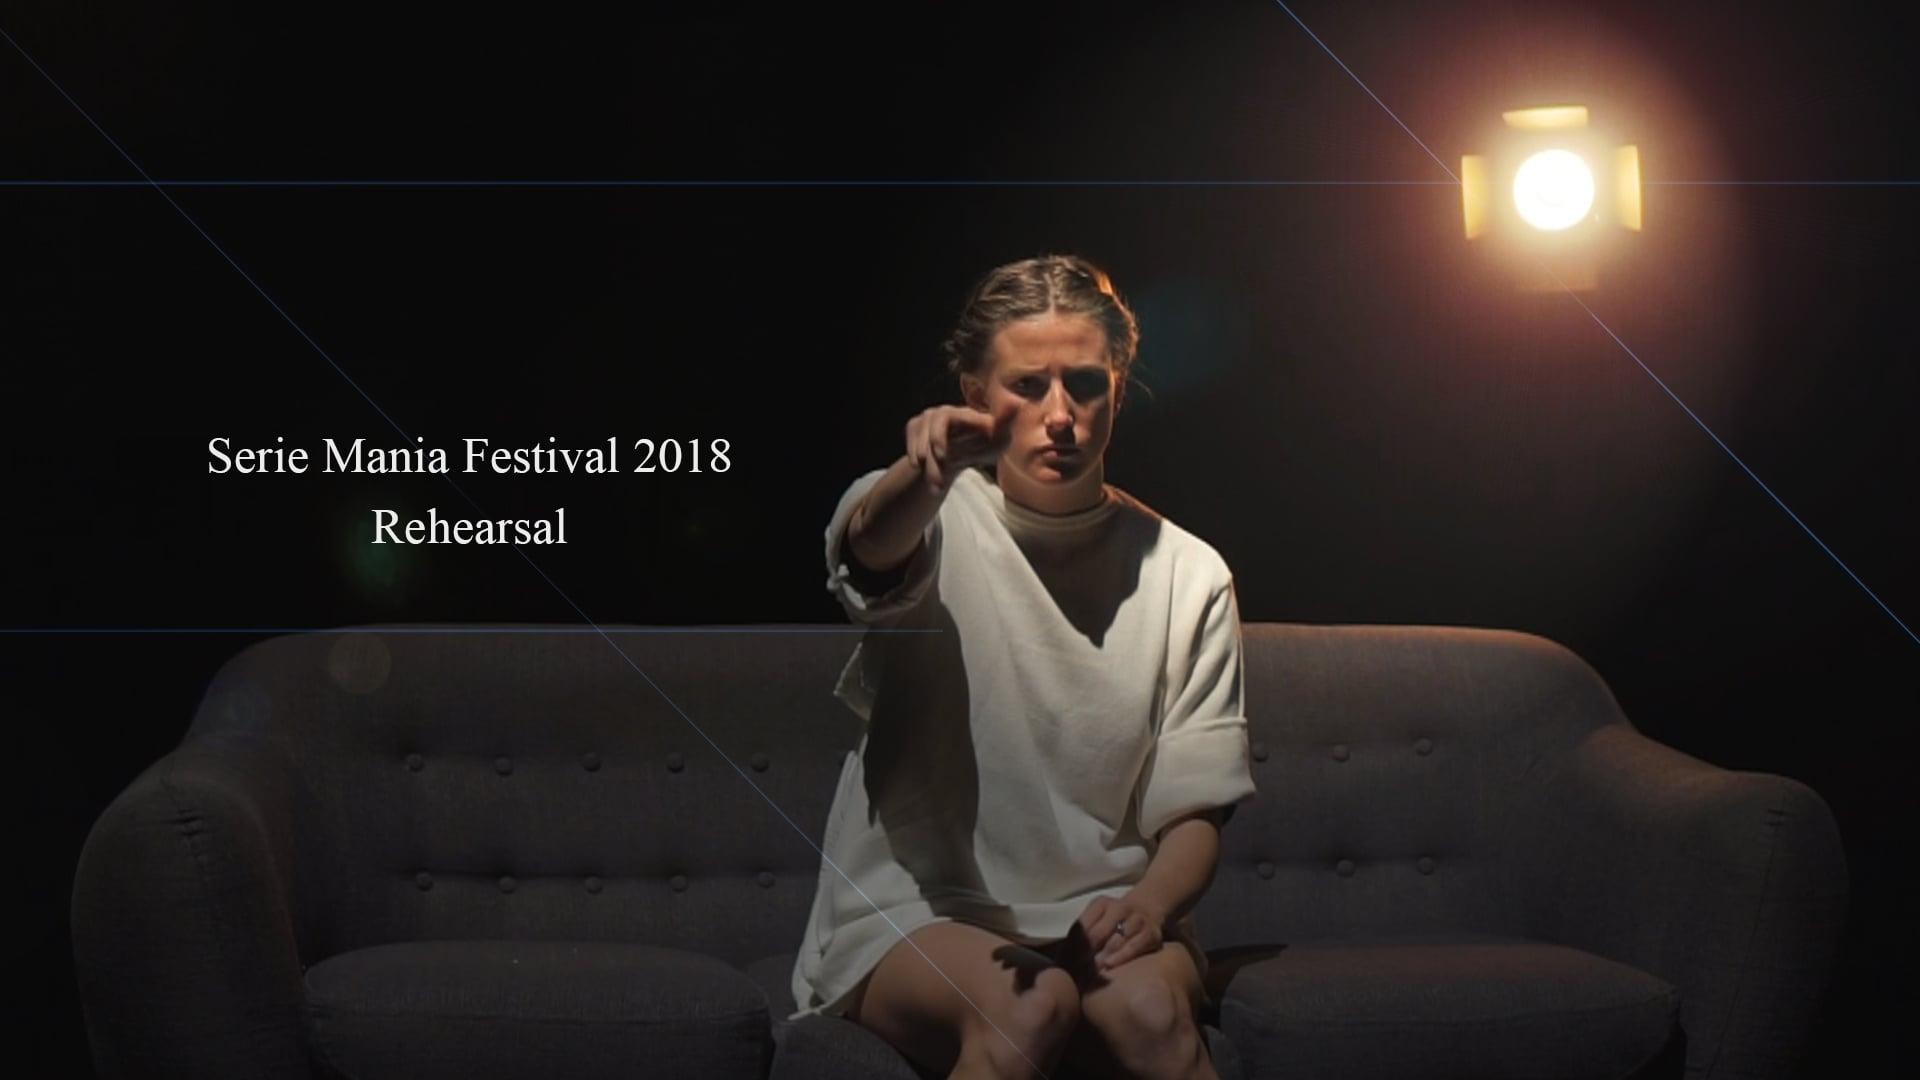 rehearsal serie mania 2018